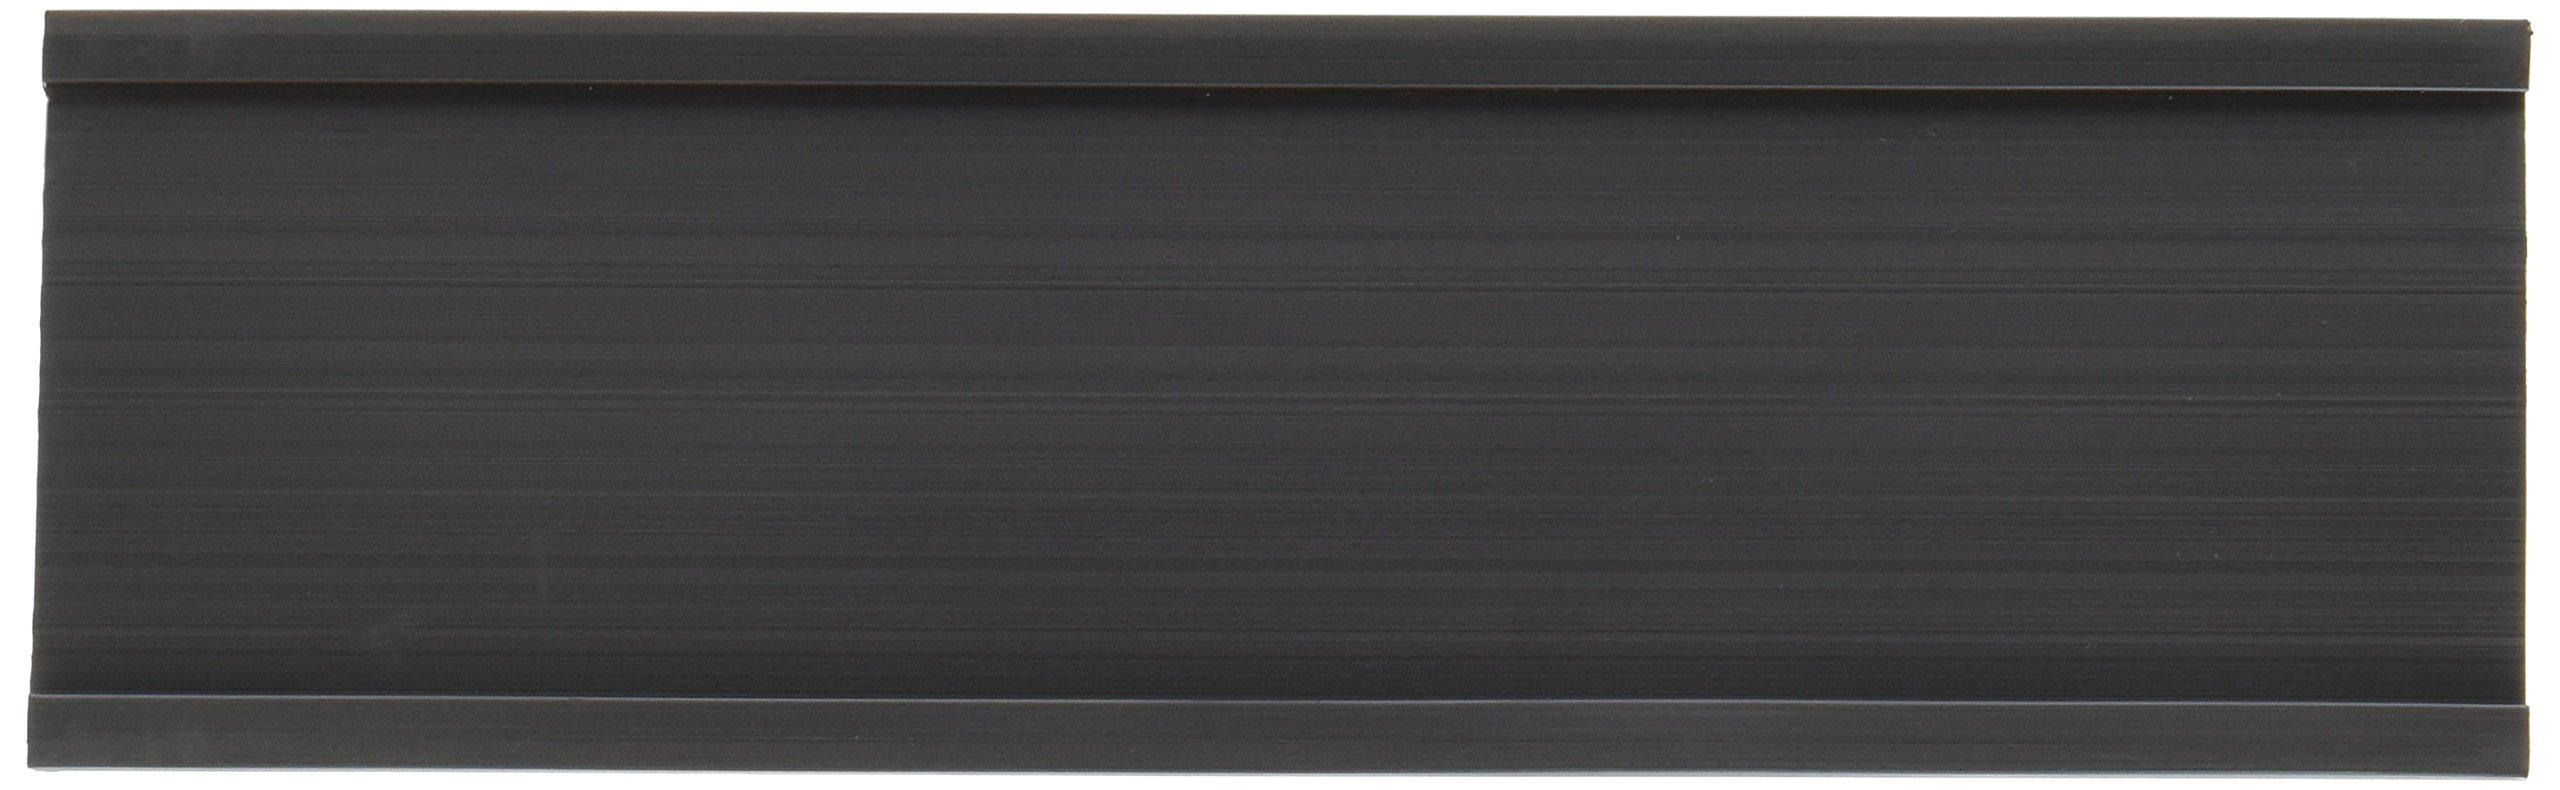 AIGNER MC-206 Magnetic Label Holders, 6'' x 2''